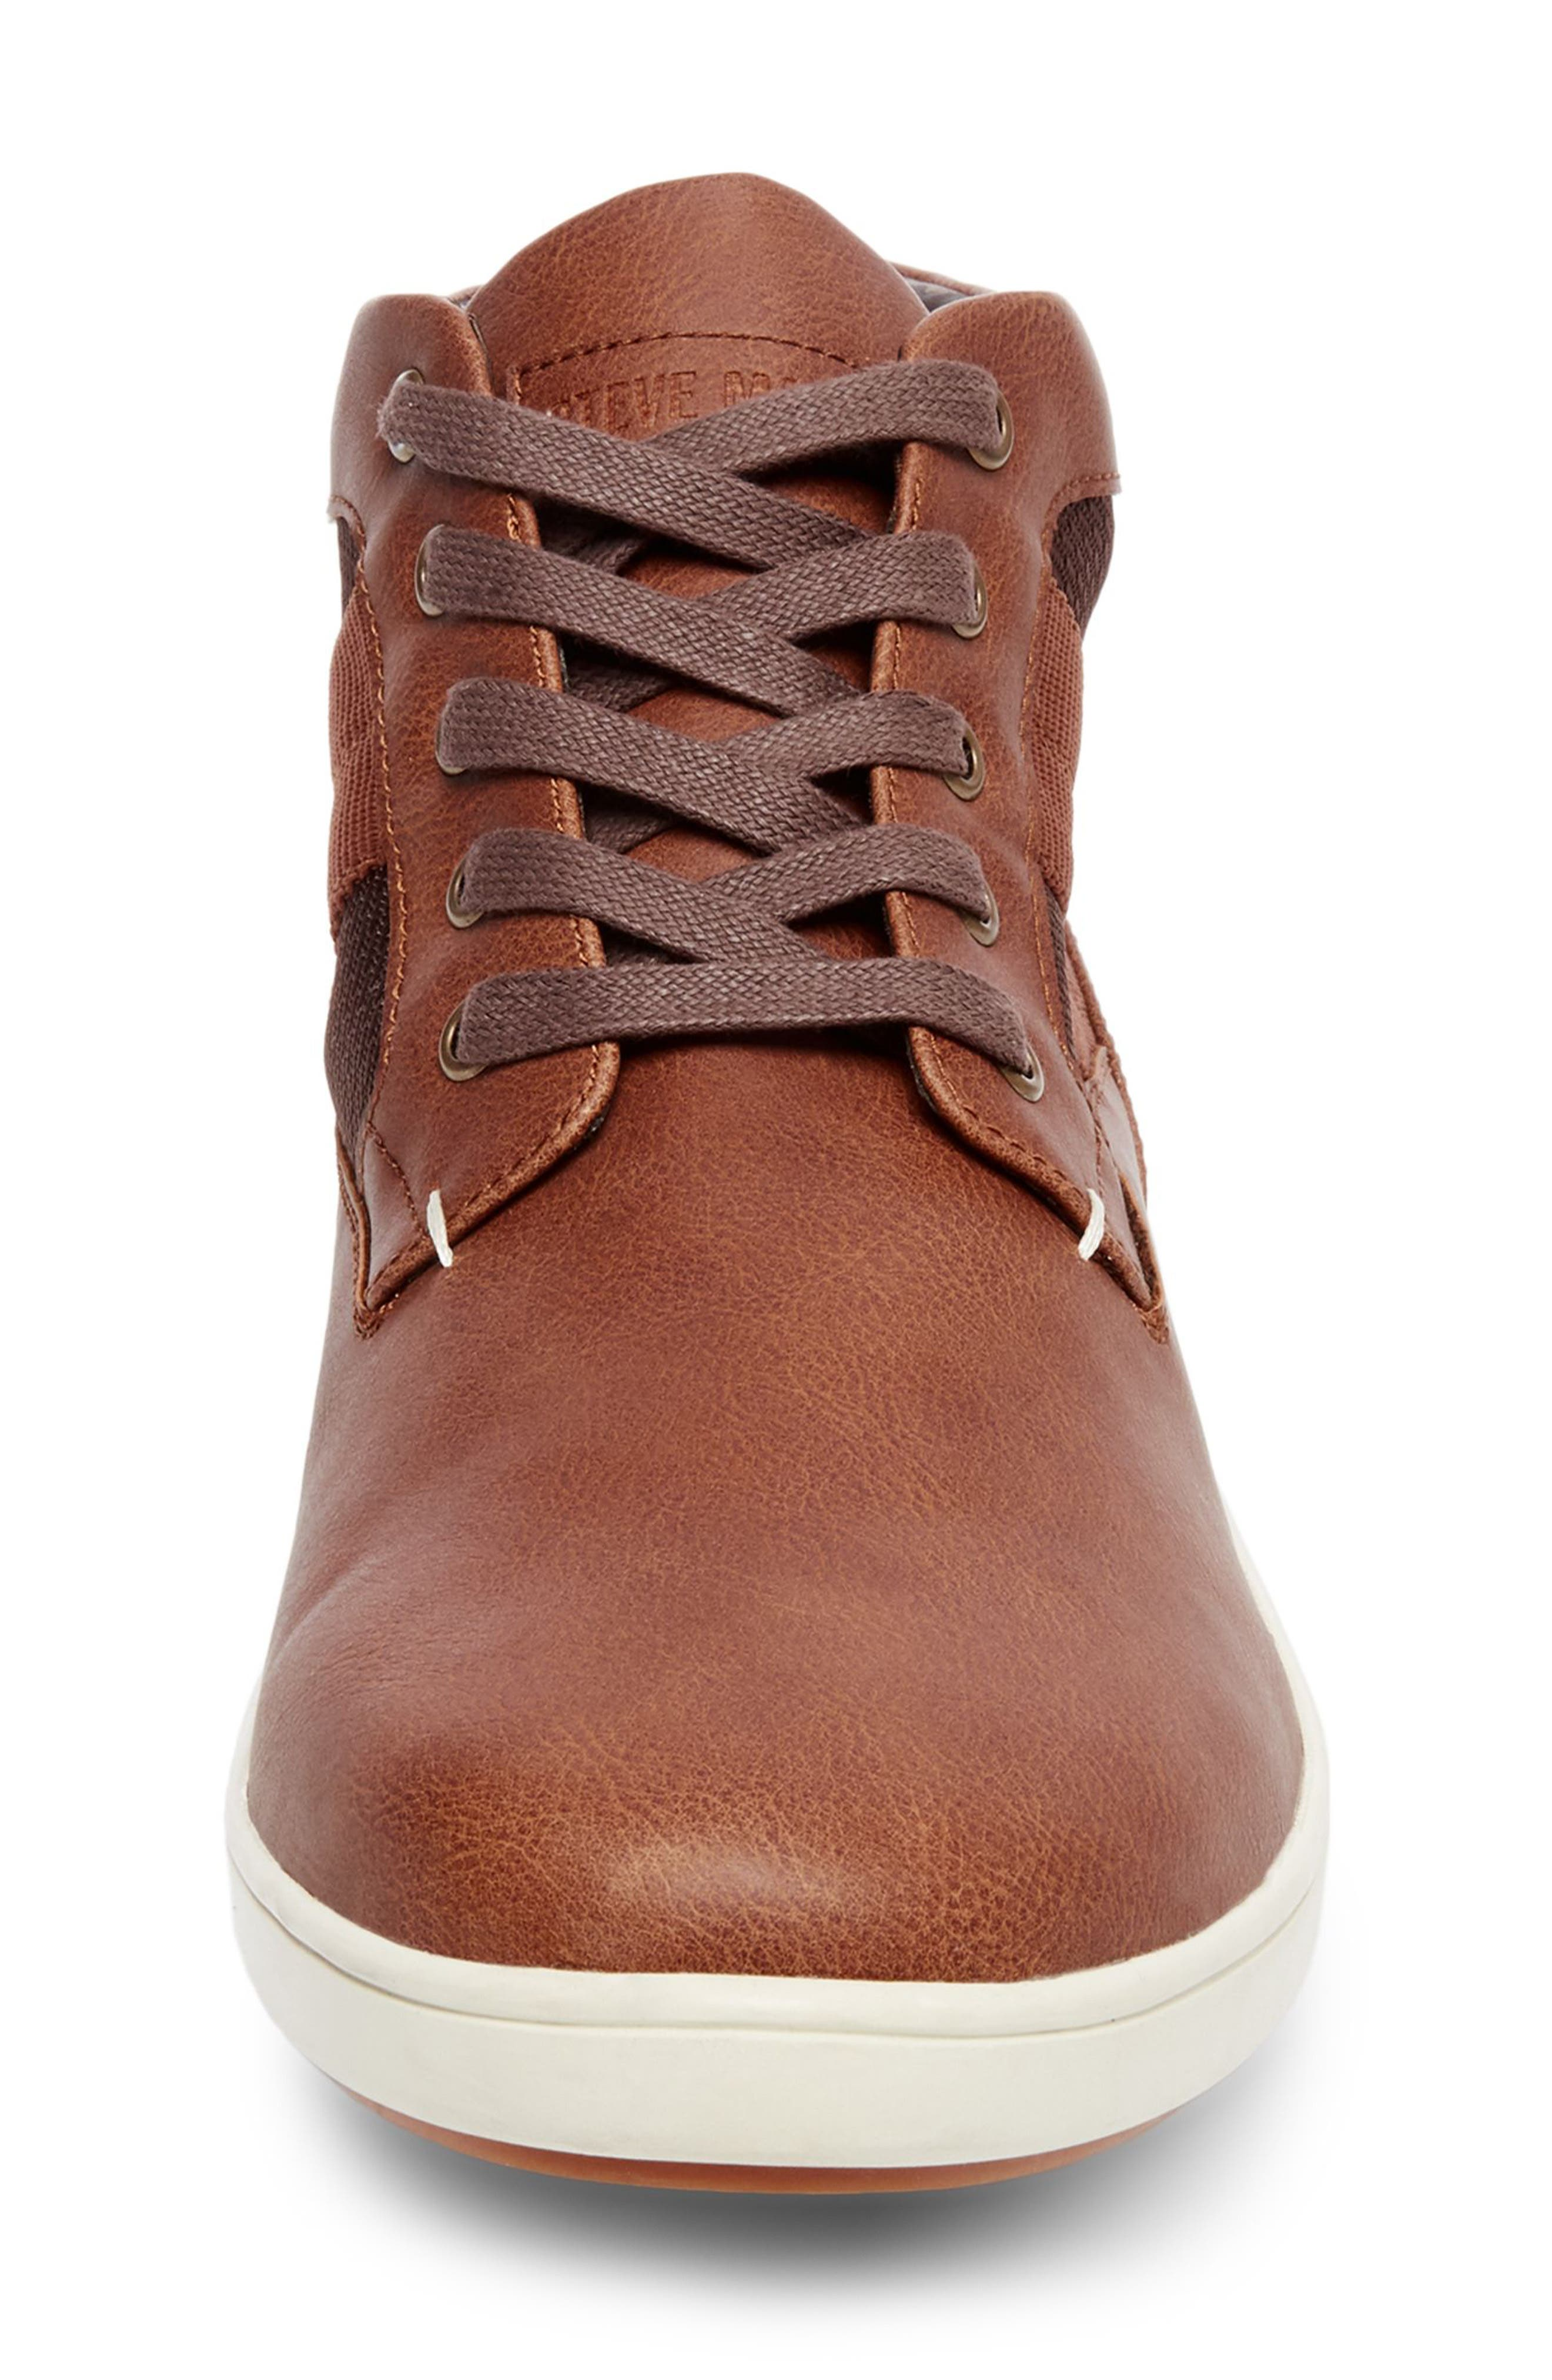 Frazier Sneaker Boot,                             Alternate thumbnail 4, color,                             Cognac